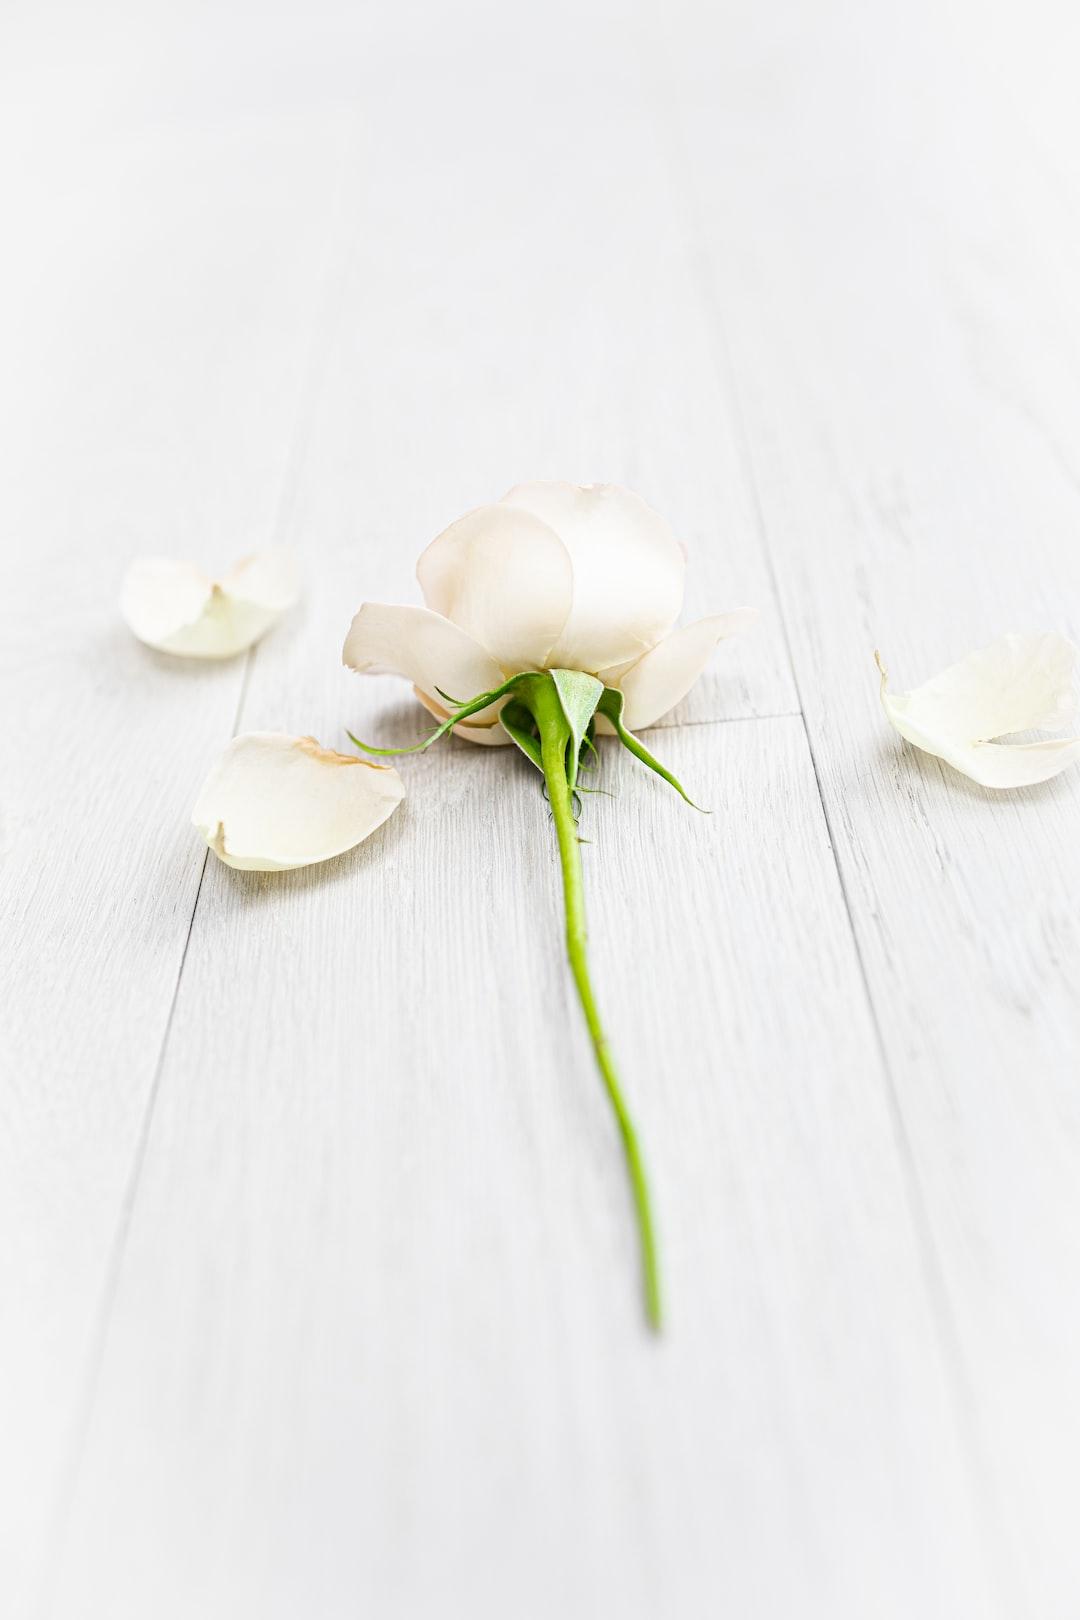 A rose lying on wood.